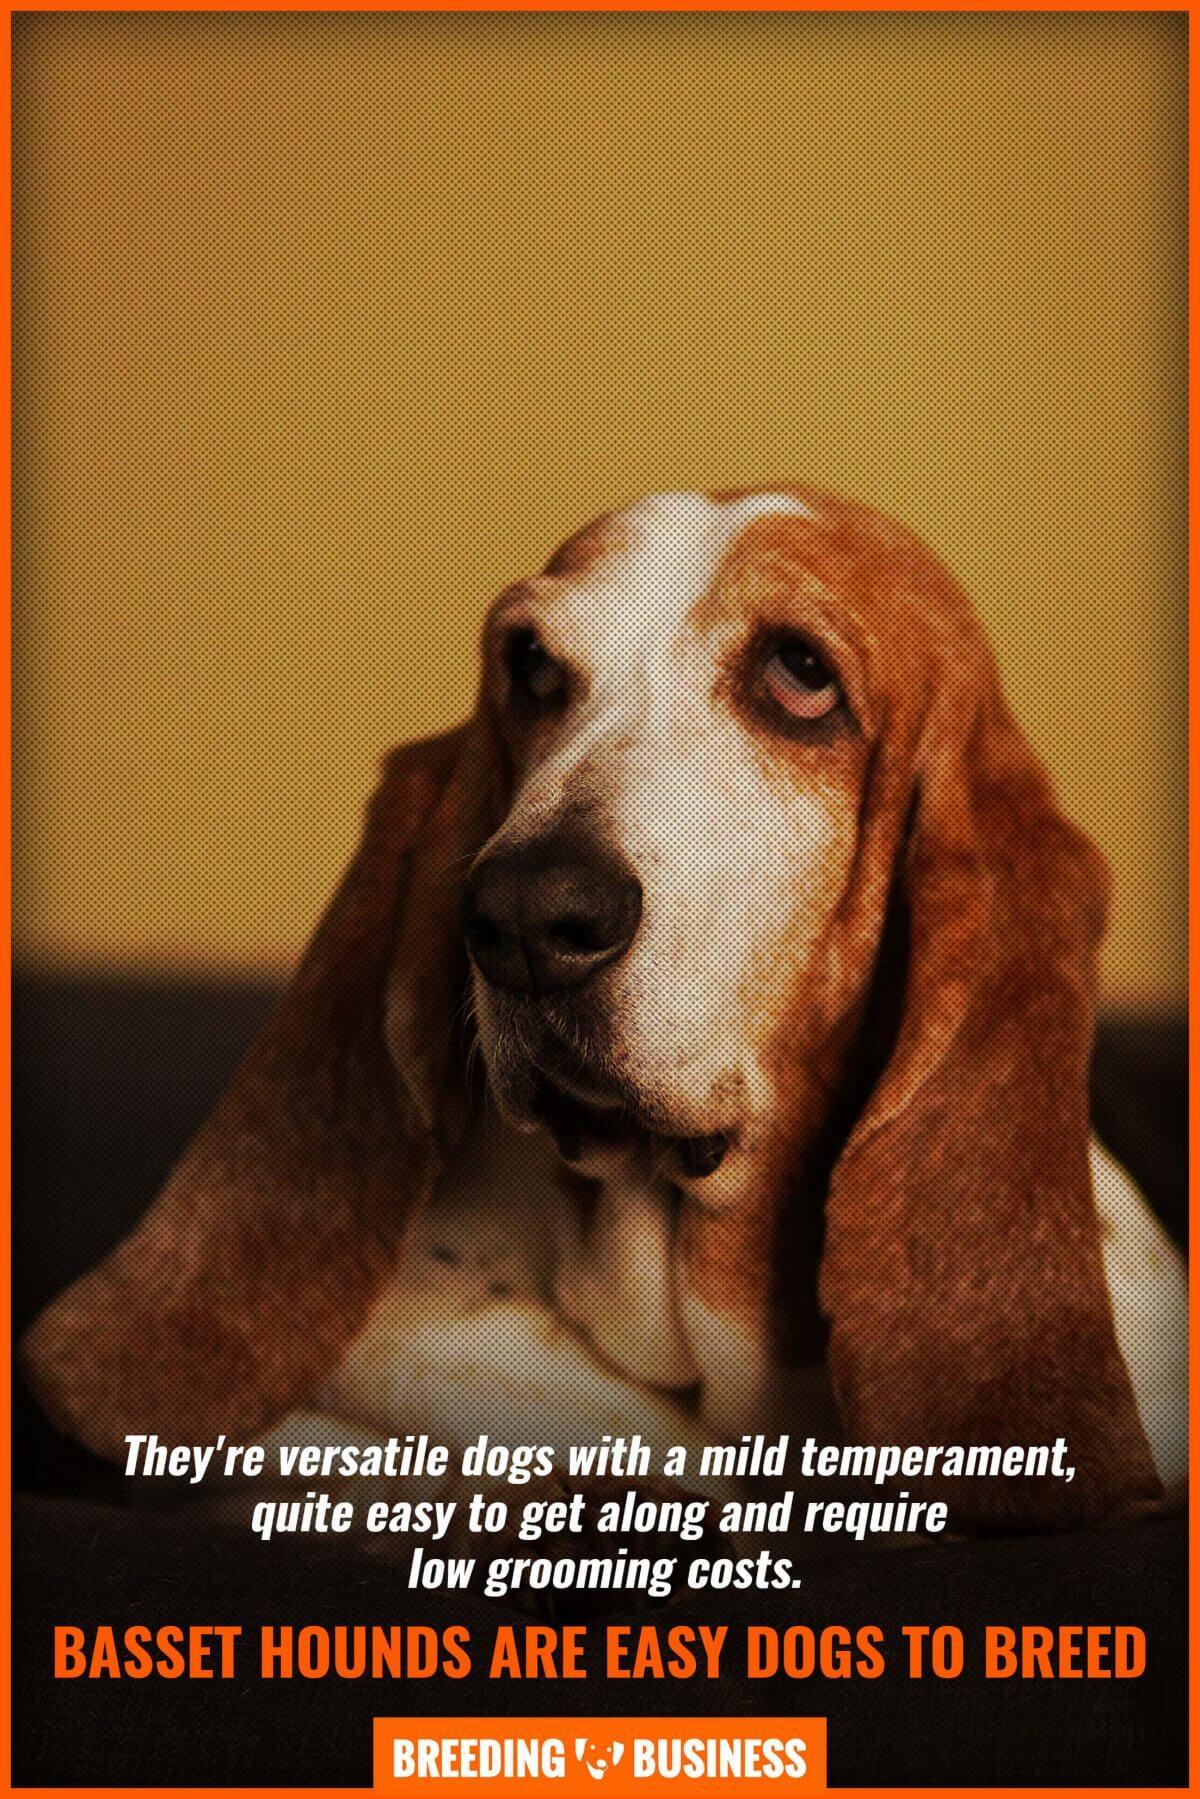 breeding basset hounds